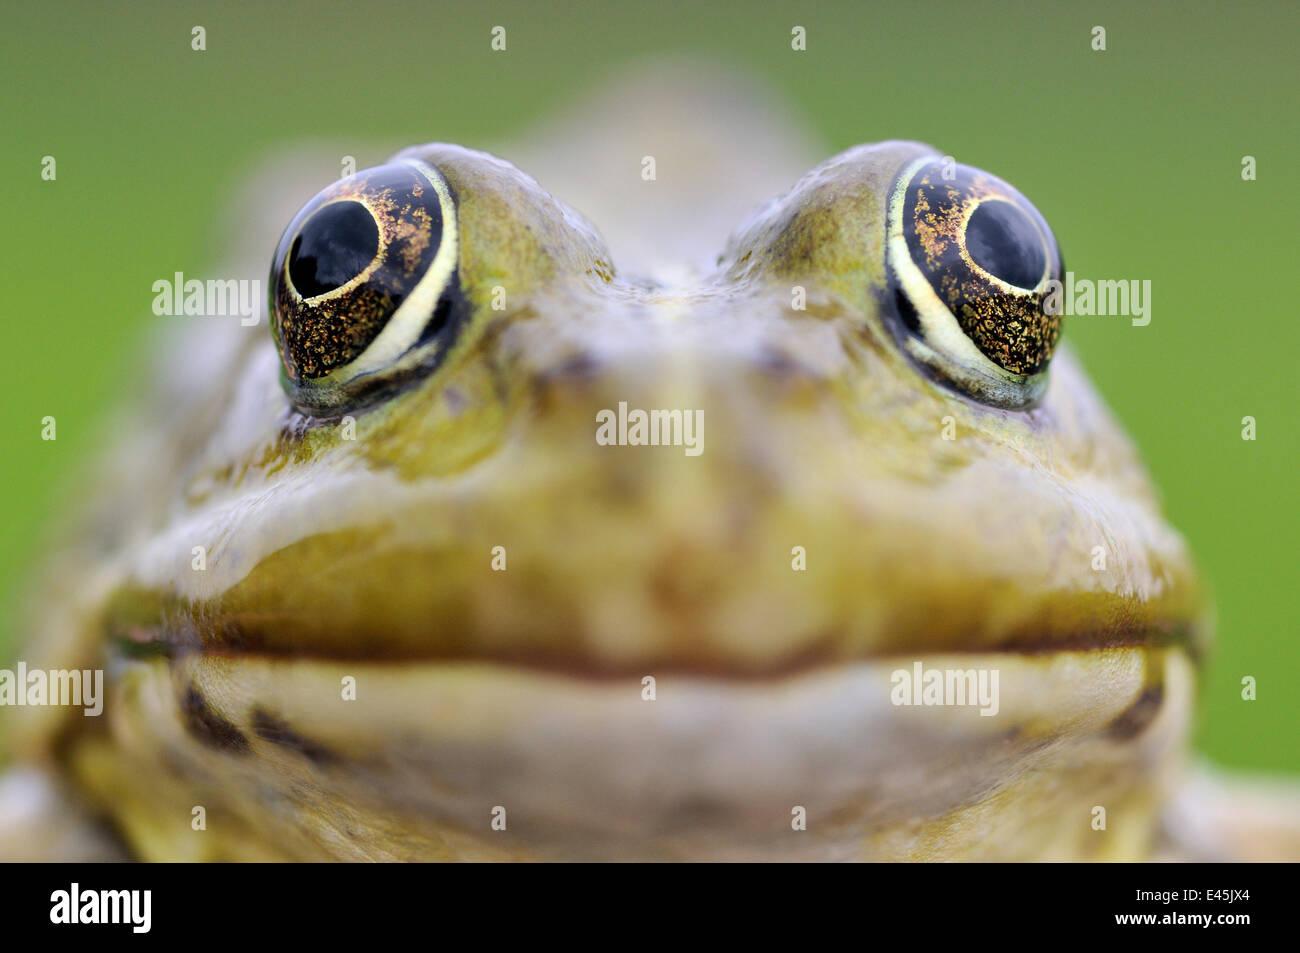 European edible frog (Rana Esculenta) close-up, Prypiat area, Belarus, June 2009 - Stock Image